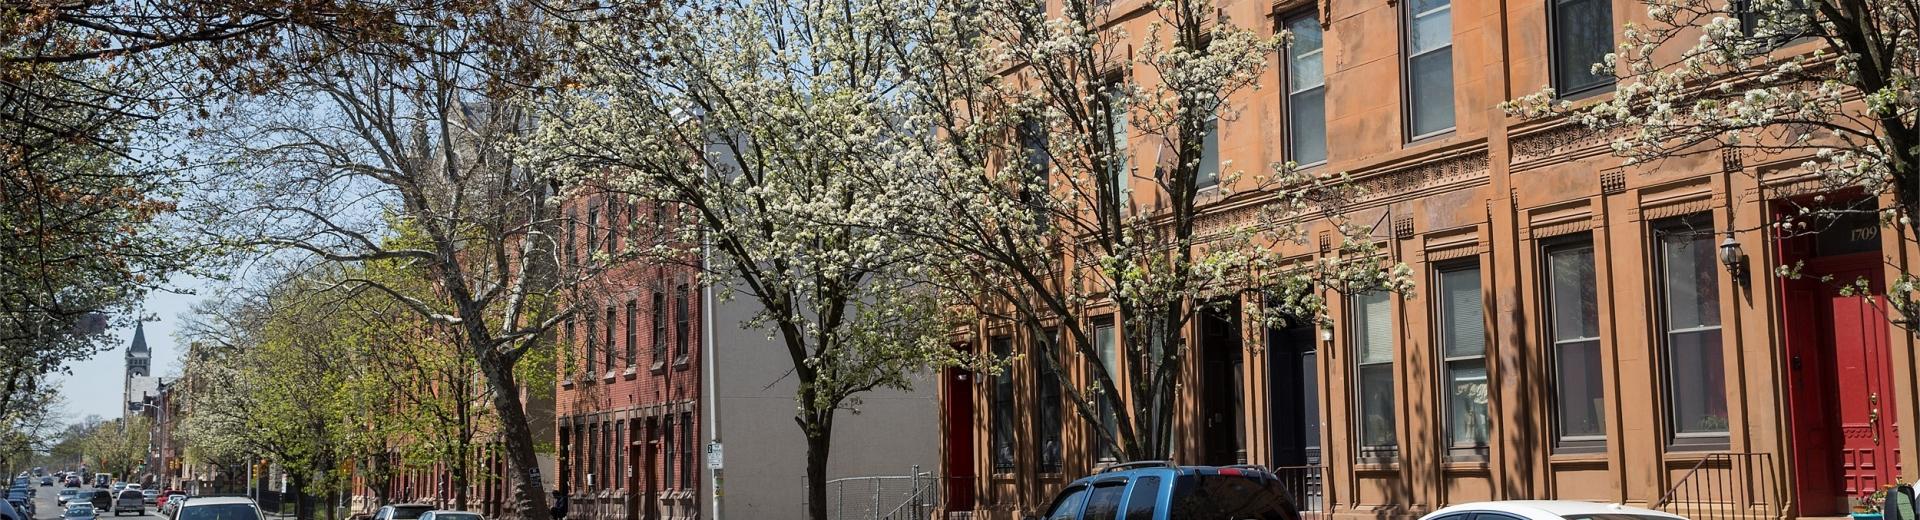 North philly neighborhood street with flowering trees